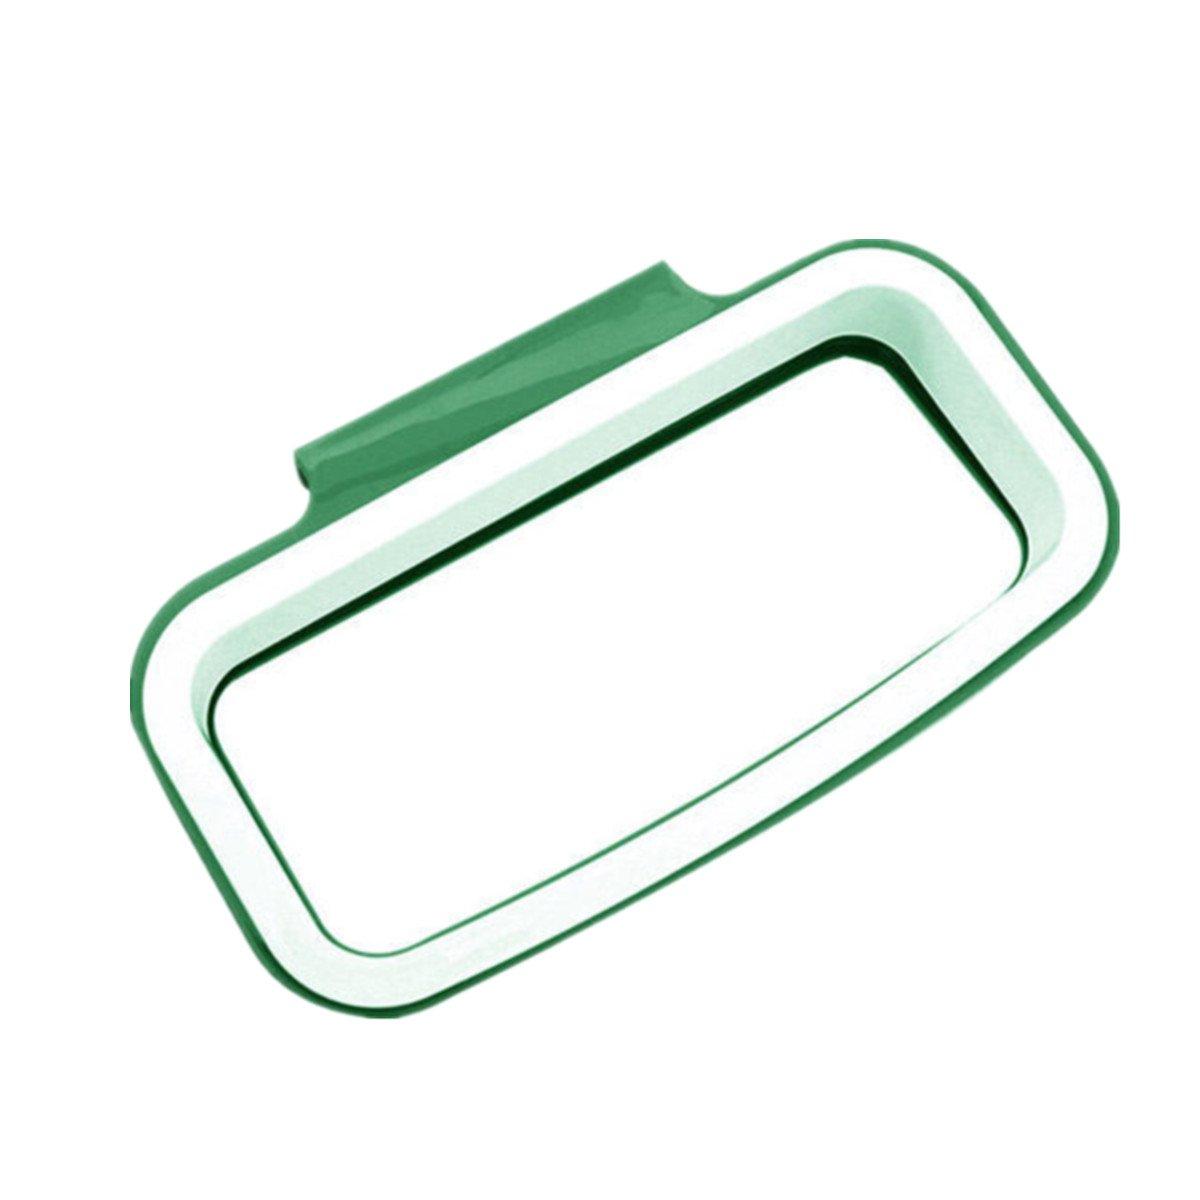 StyleZ Portable Plastic Door Garbage Trash Bag Bracket Rack Stand Holder Kitchen Tool